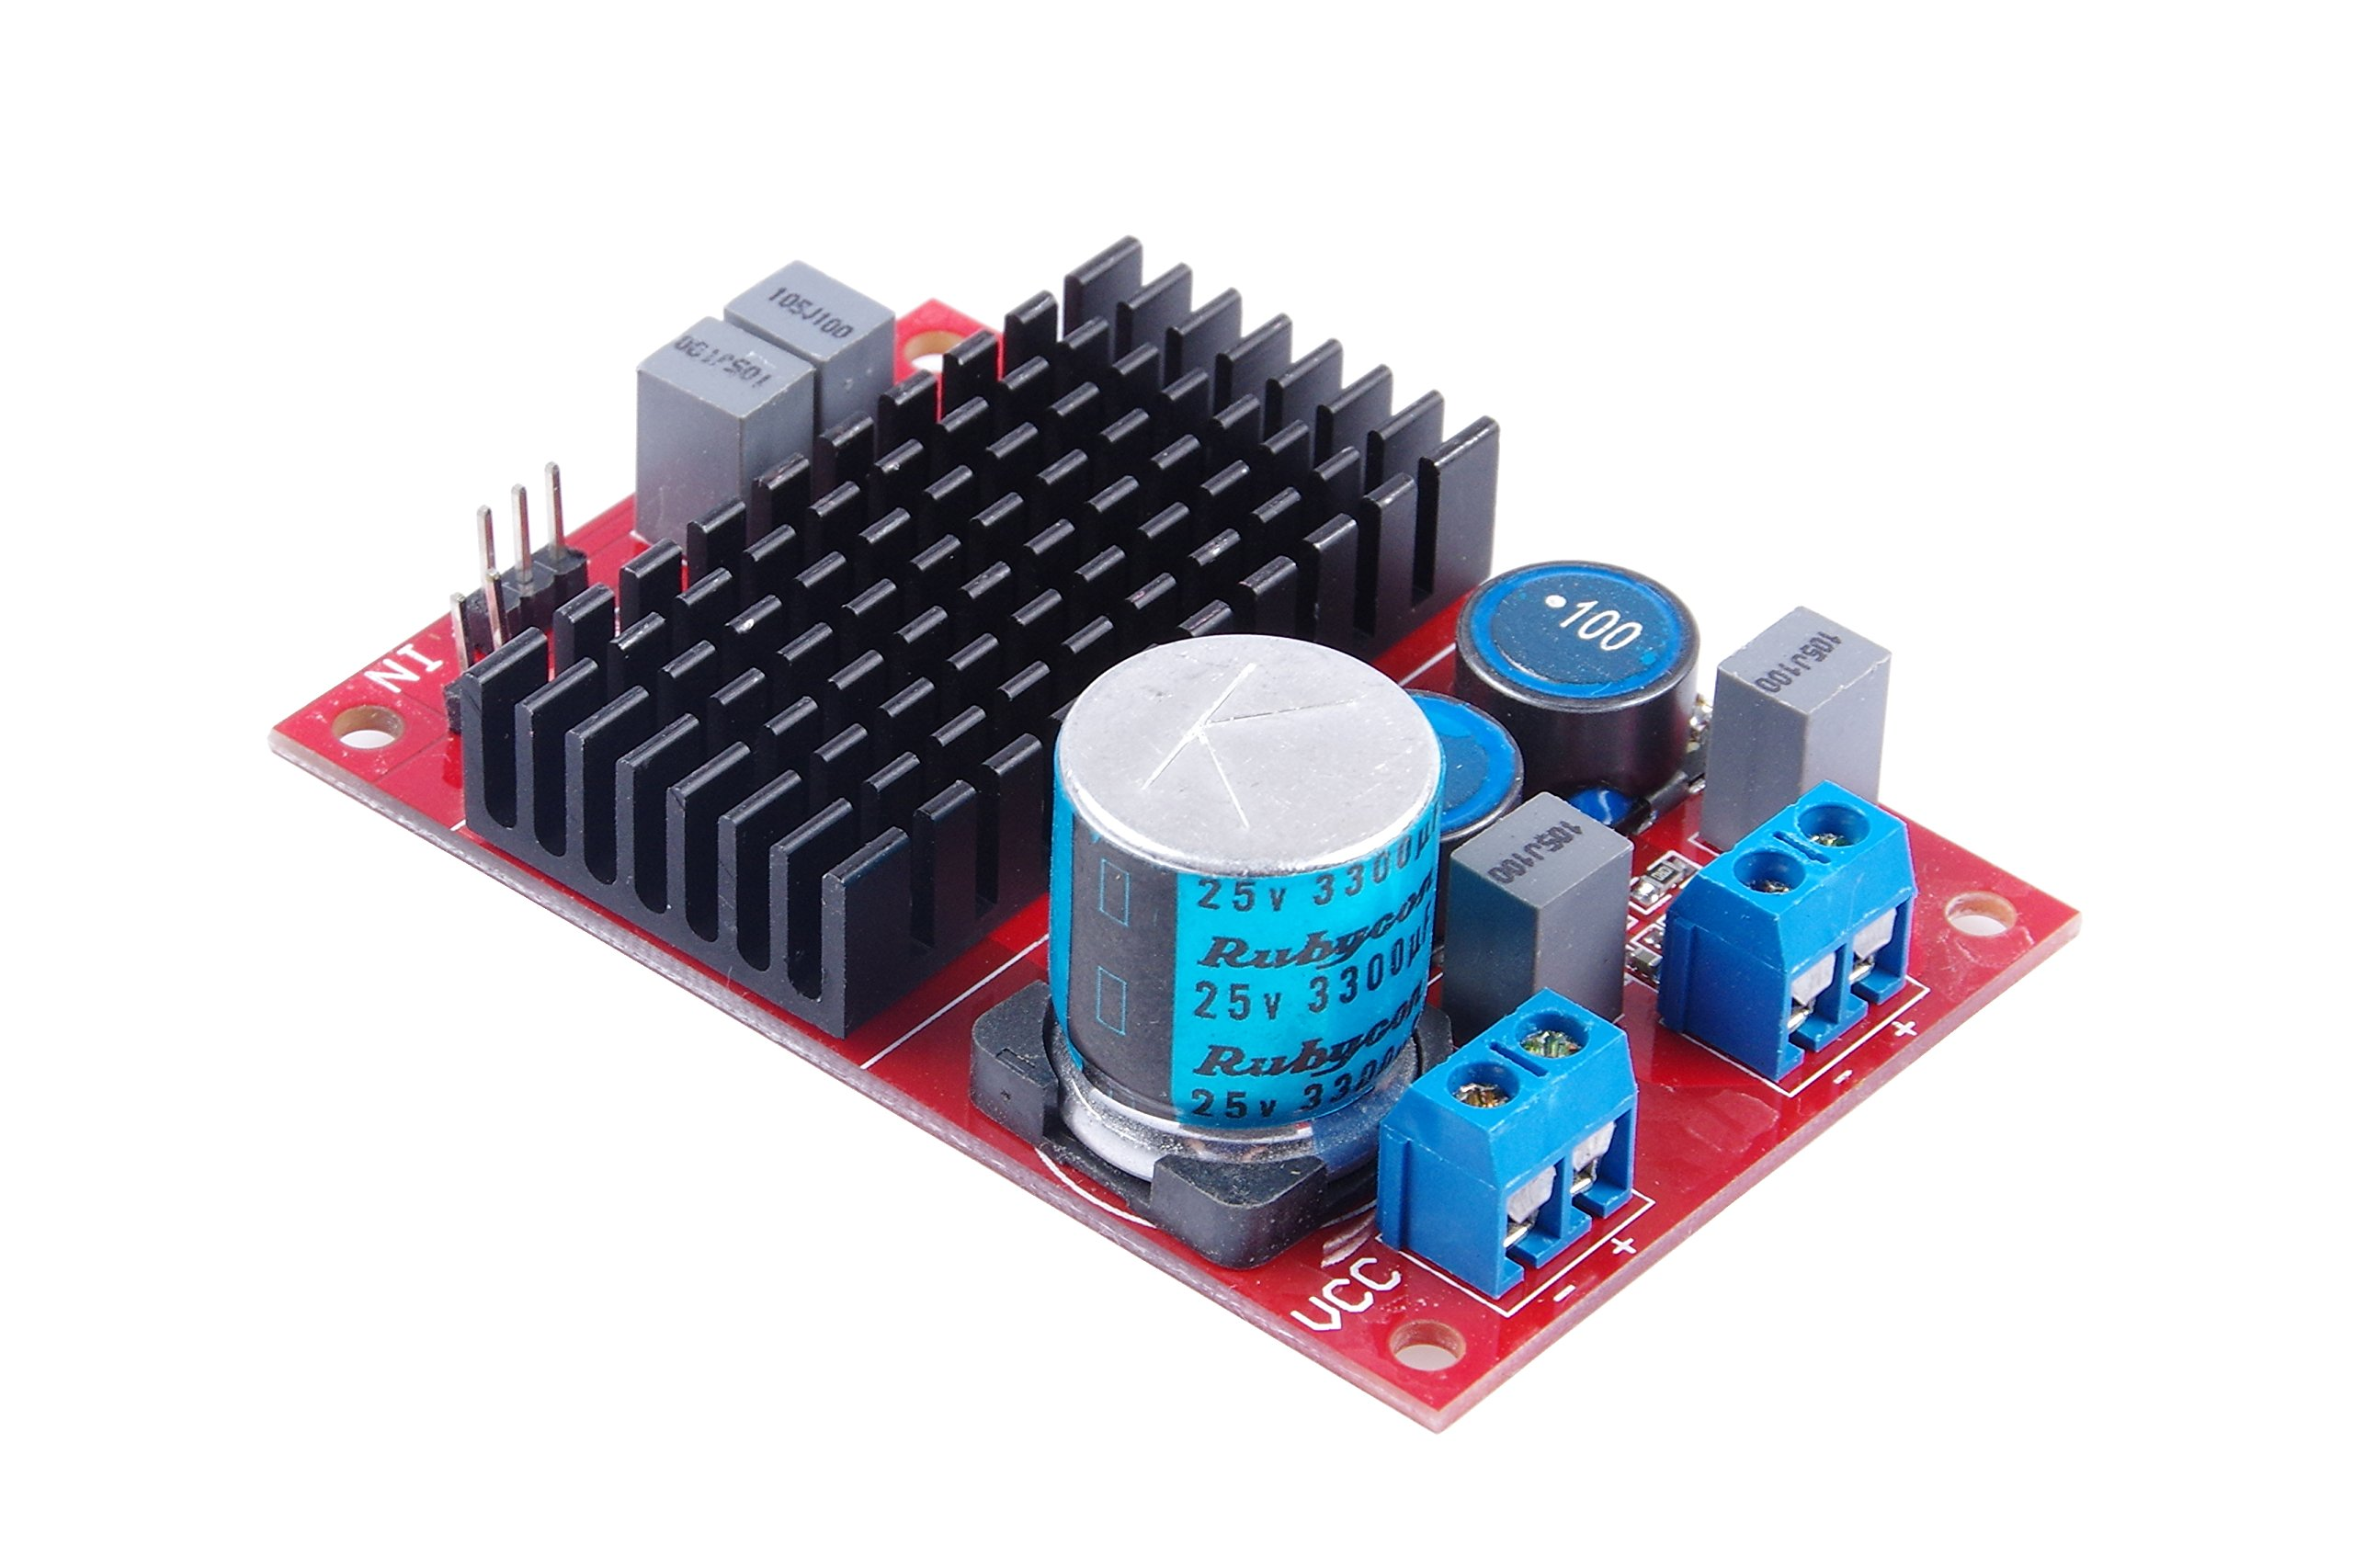 KNACRO TPA3116 Digital Power Amplifier Board Mono BTL Output Maximum Power 100W DC12-24V